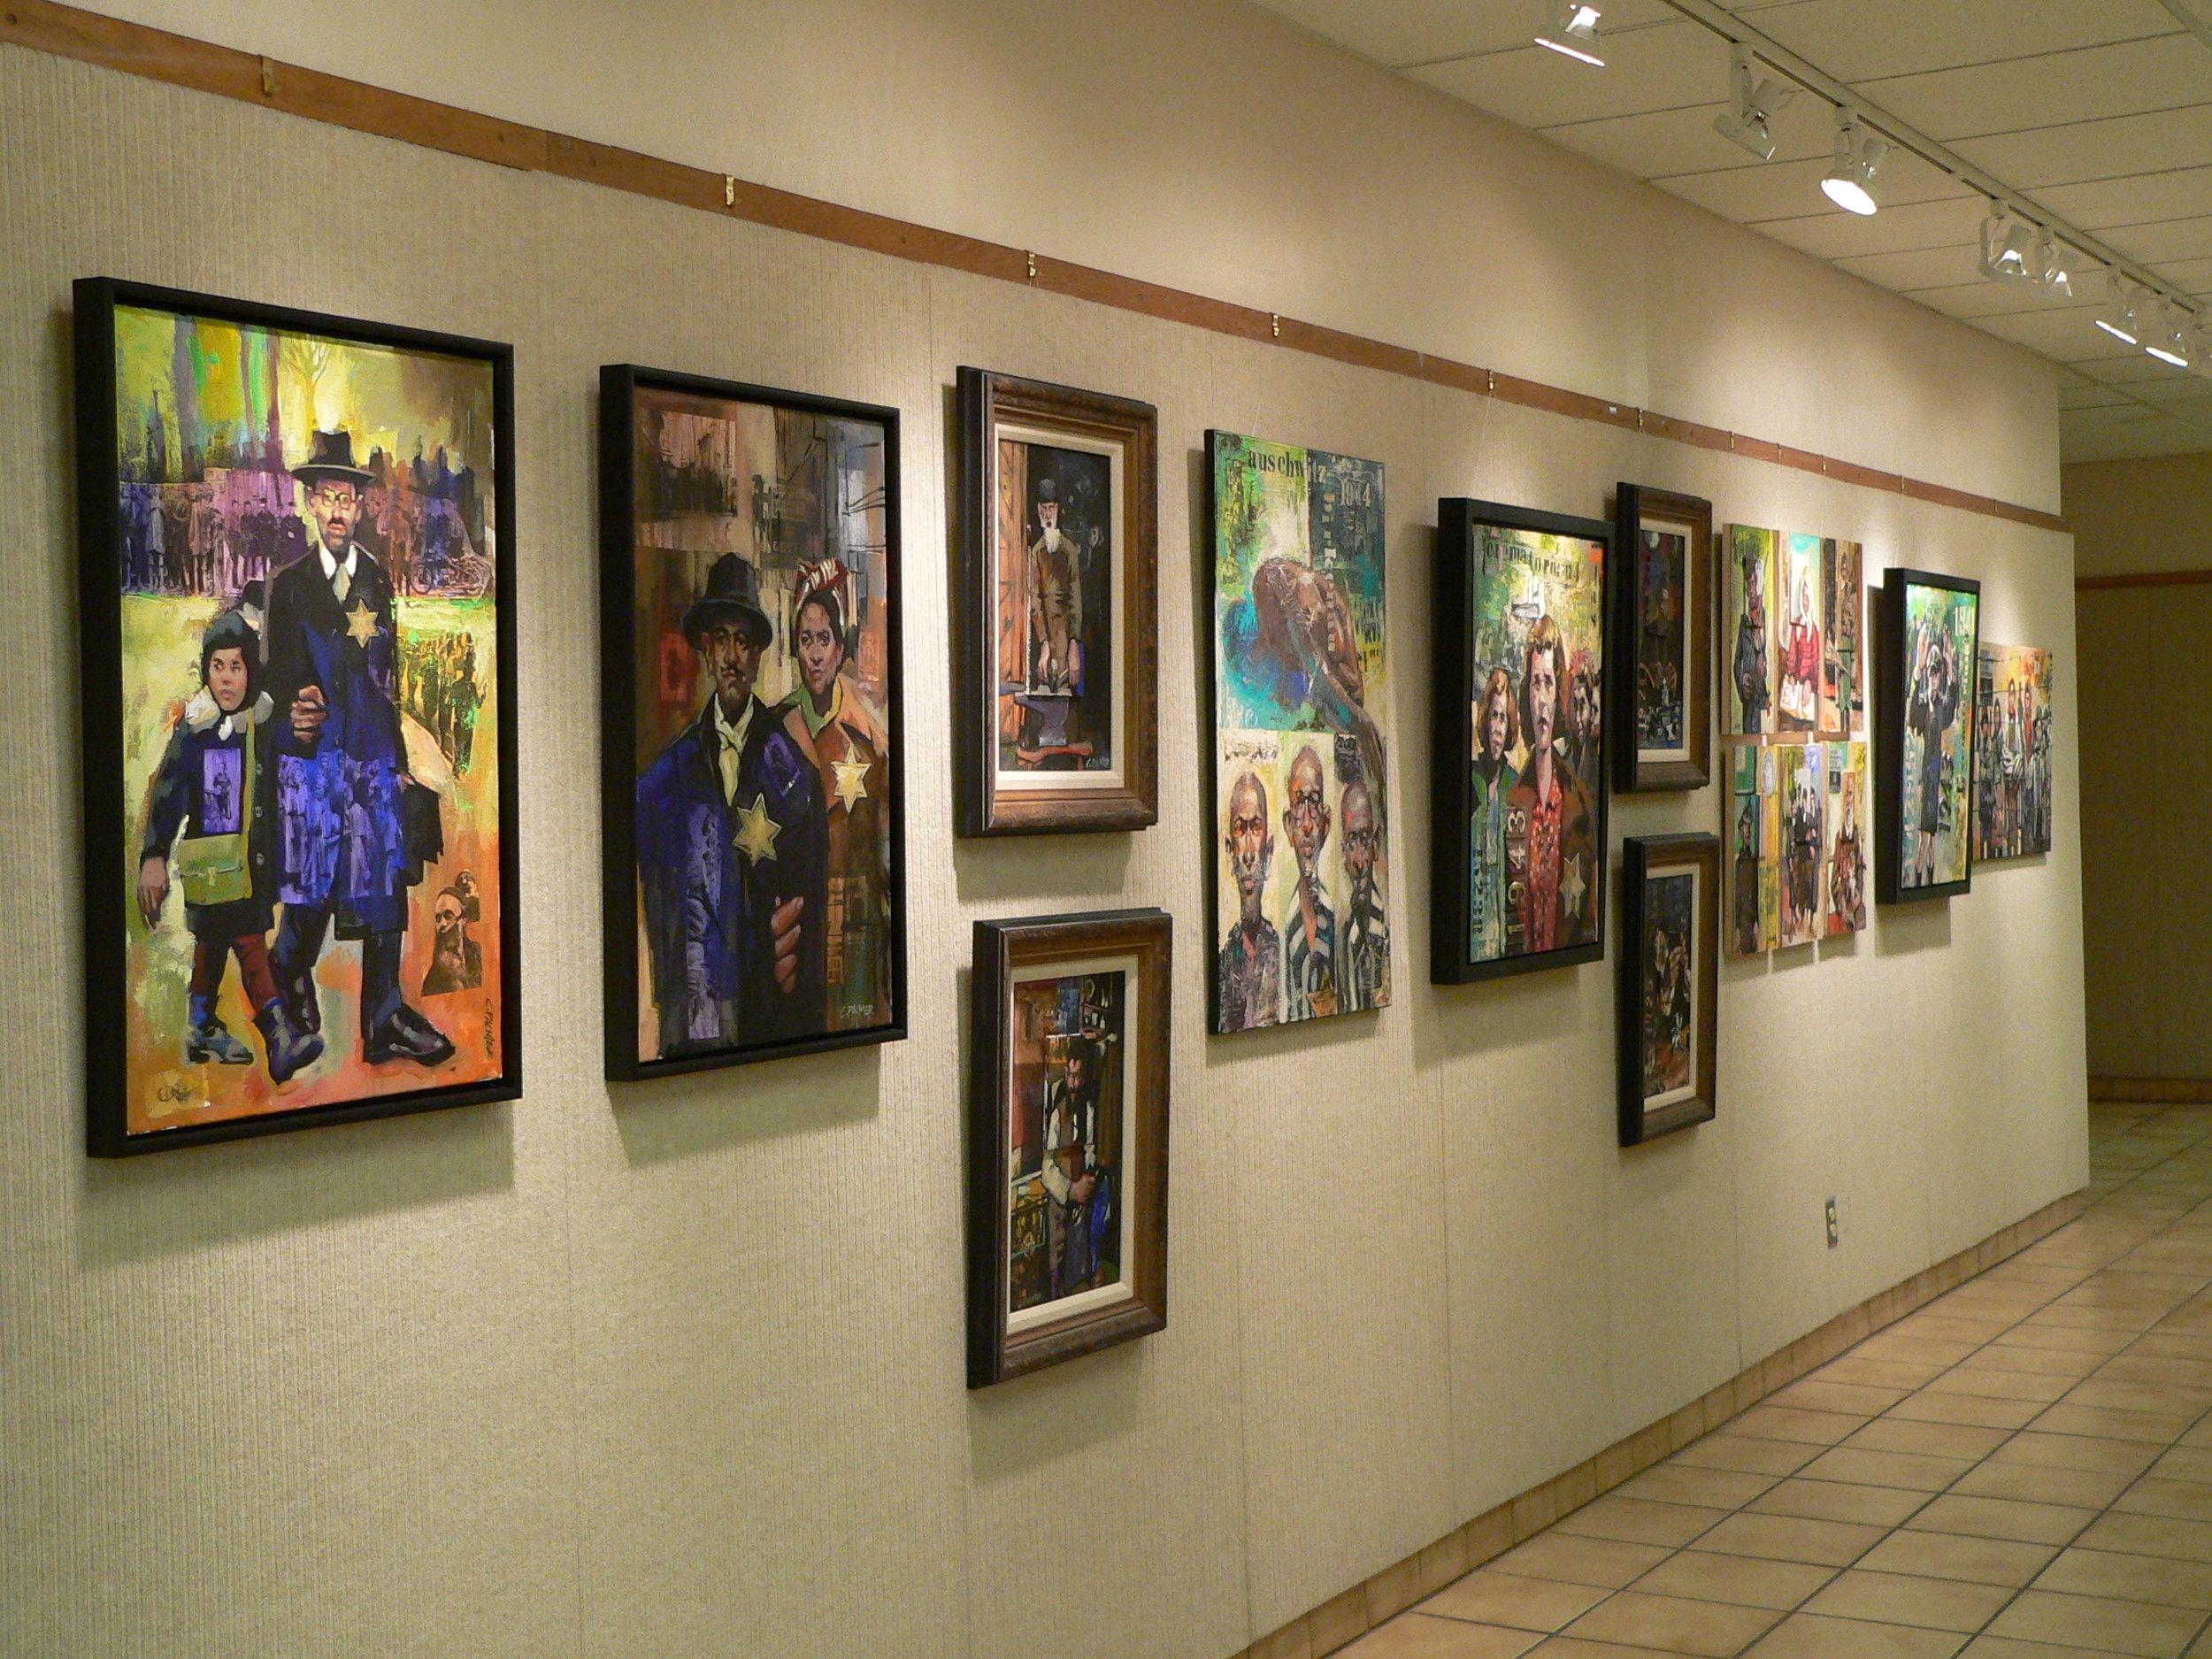 Exhibition at the Gordon Jewish Community Center